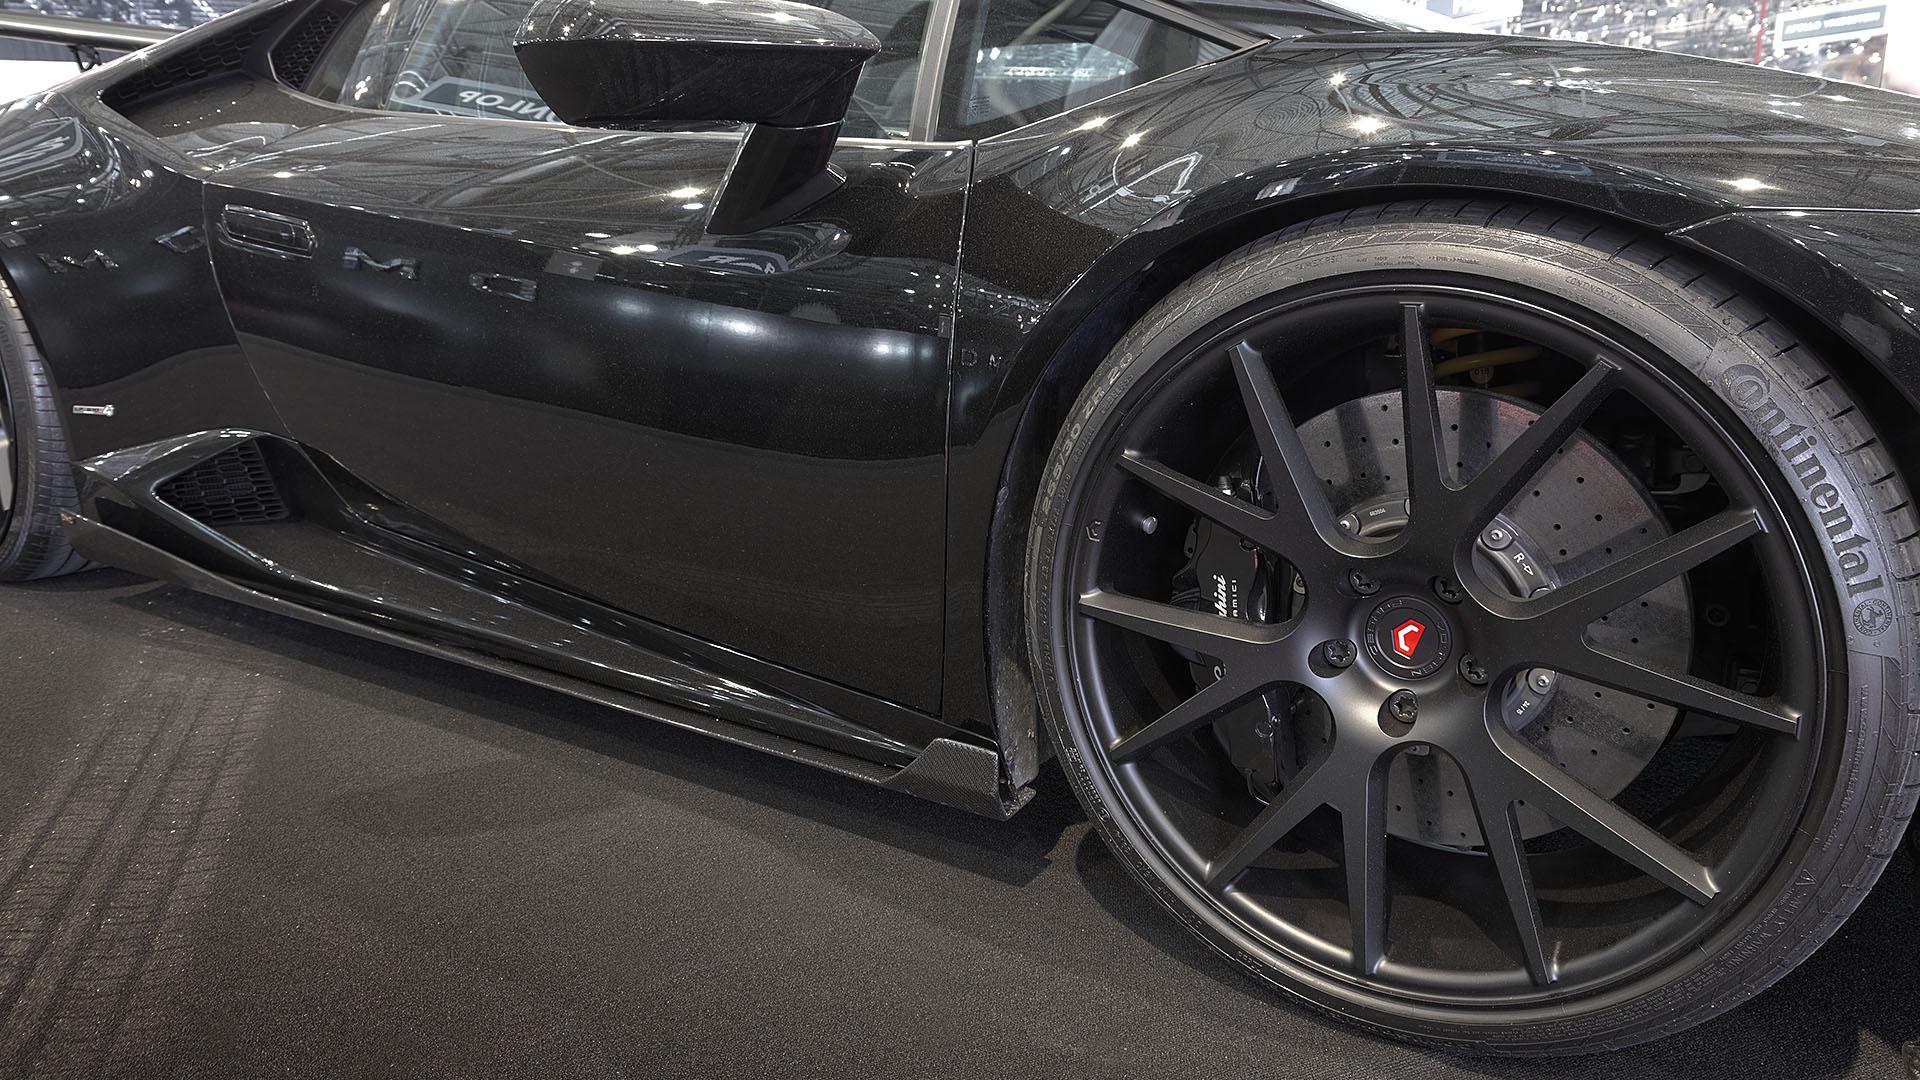 Carbon fiber side sill